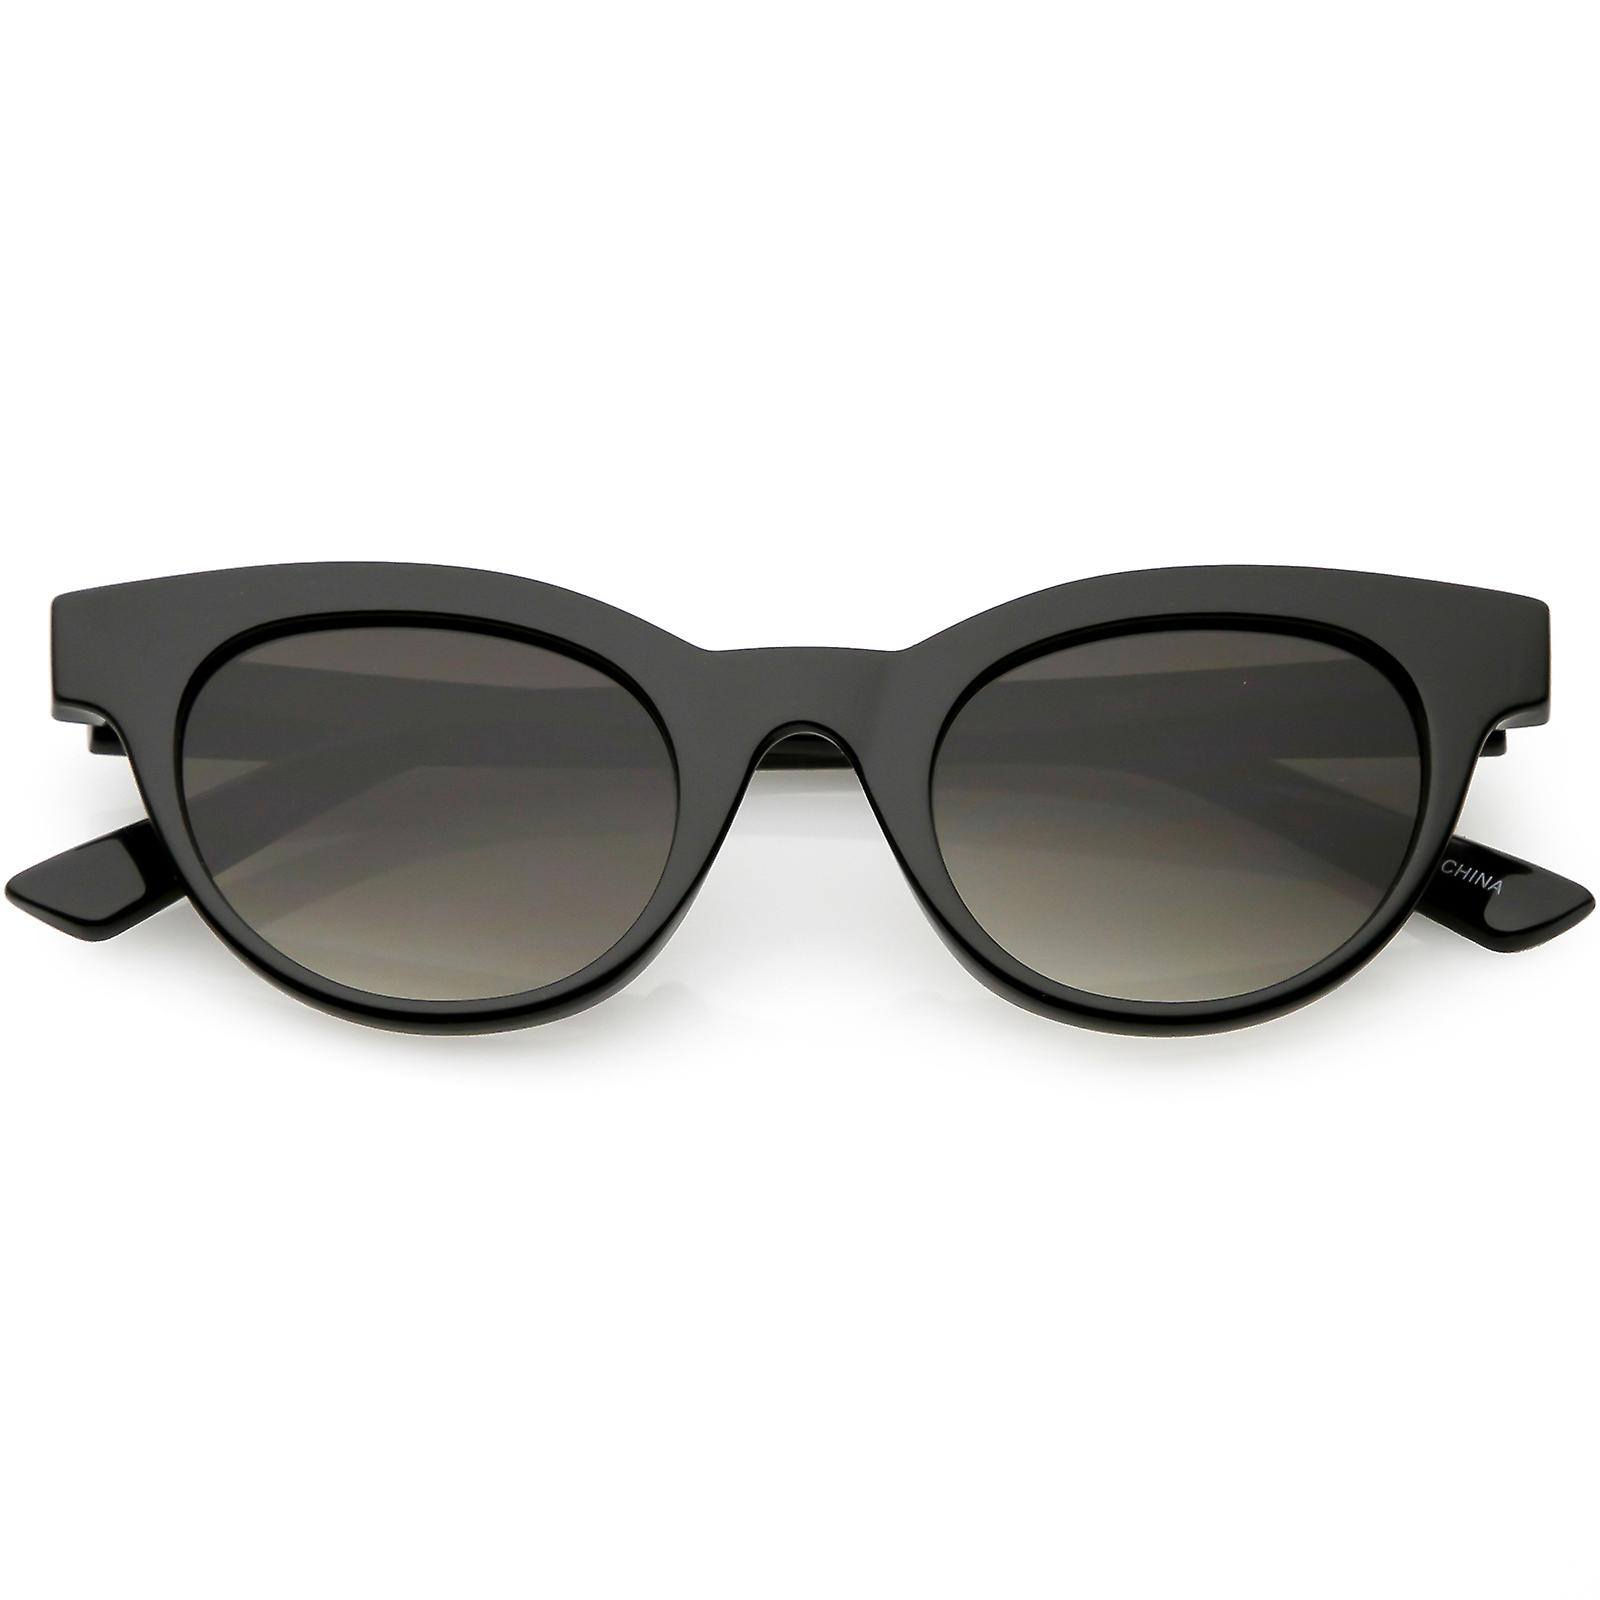 frauen horn umrandeten cat eye sonnenbrille neutral farbige allround objektiv cat eye. Black Bedroom Furniture Sets. Home Design Ideas